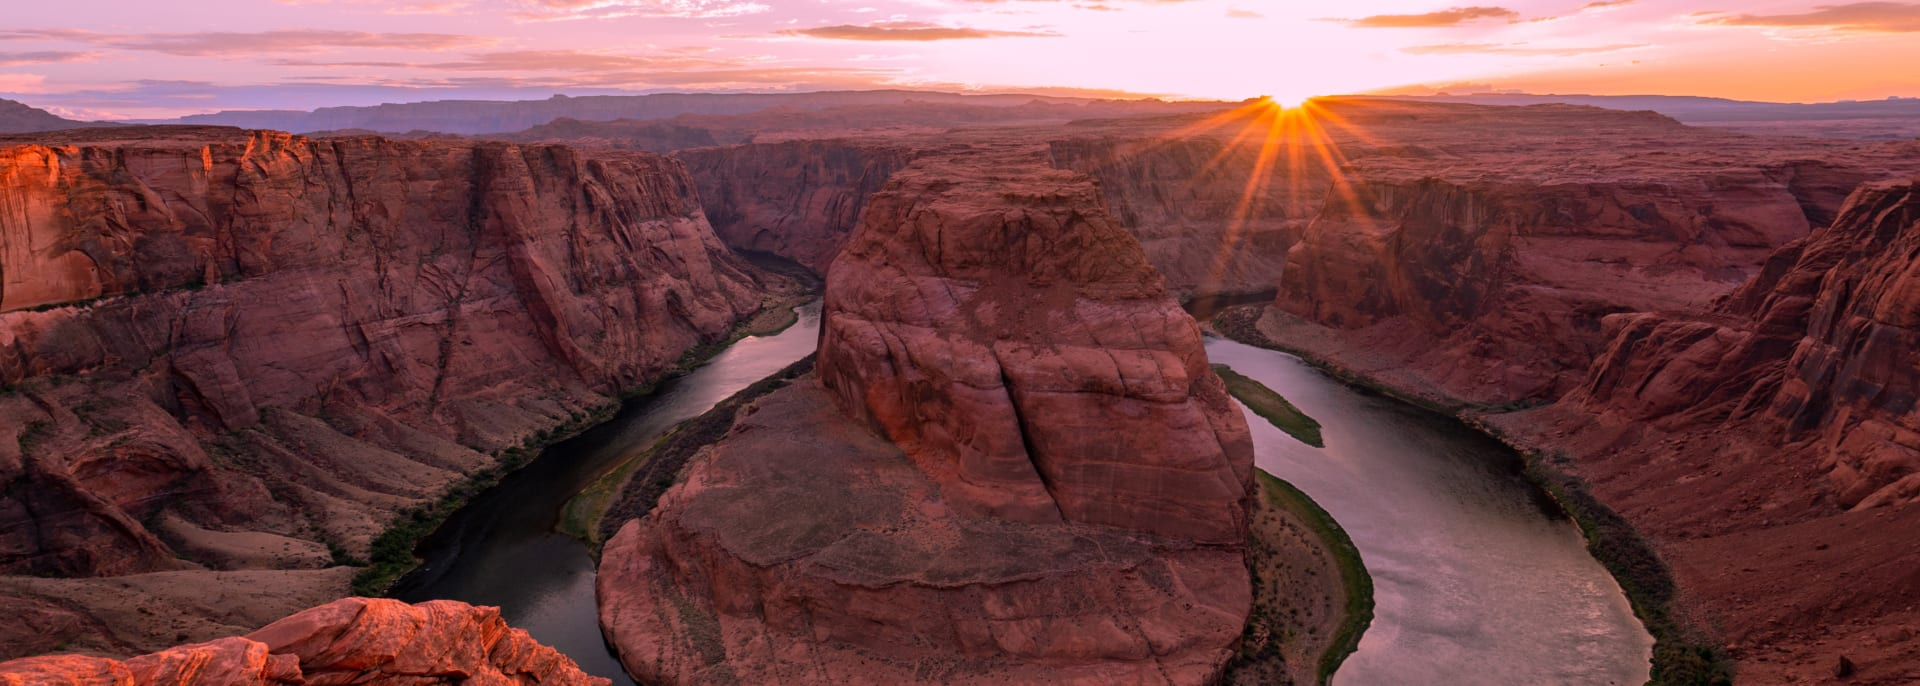 Glen Canyon National Recreation Area, USA